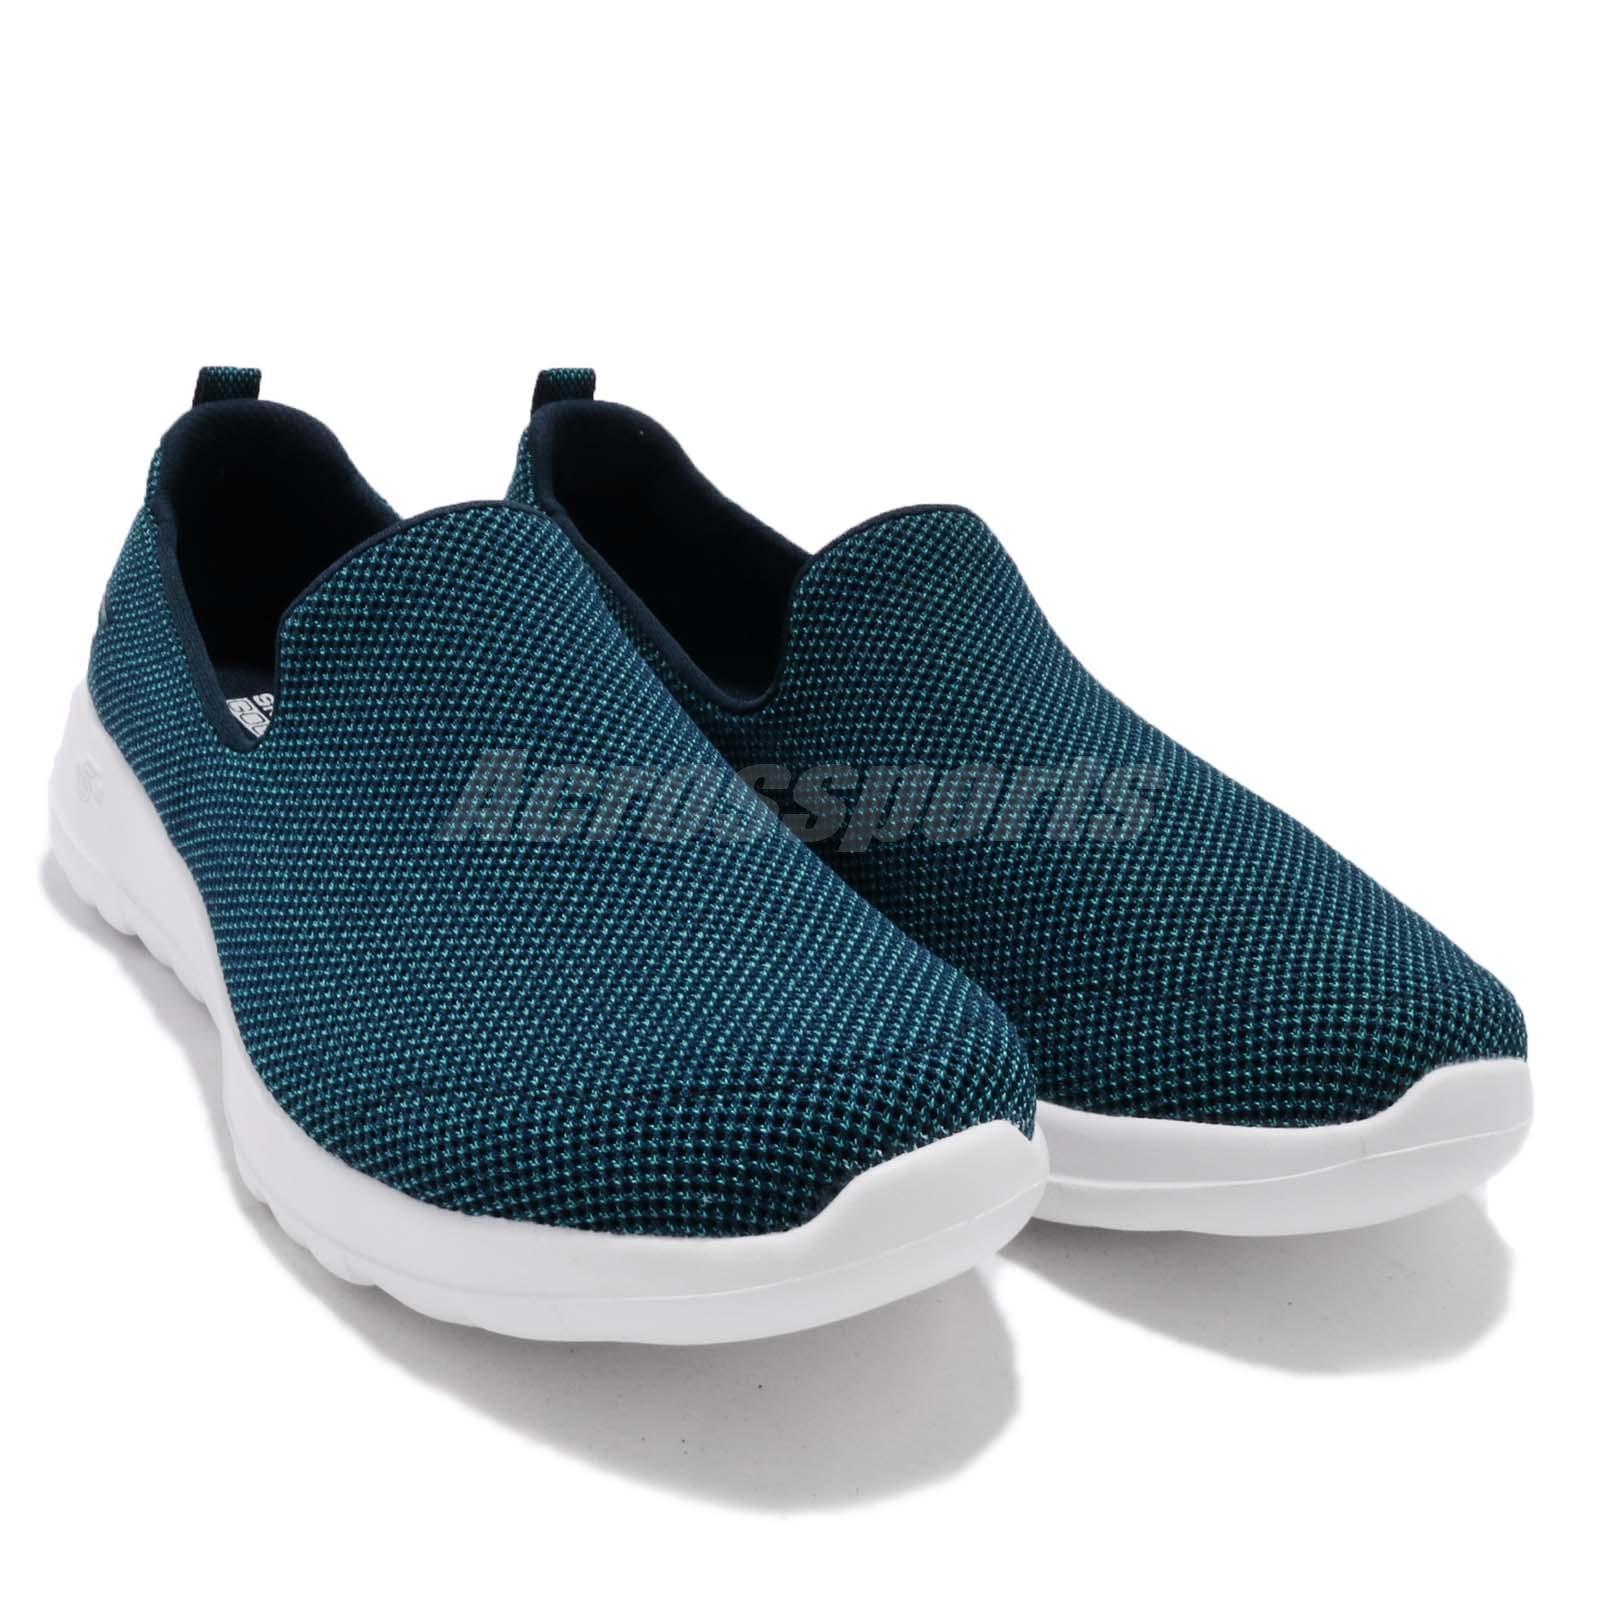 28f3599b904 Skechers Go Walk Joy Activate Teal Navy Women Walking Shoes Slip-on ...